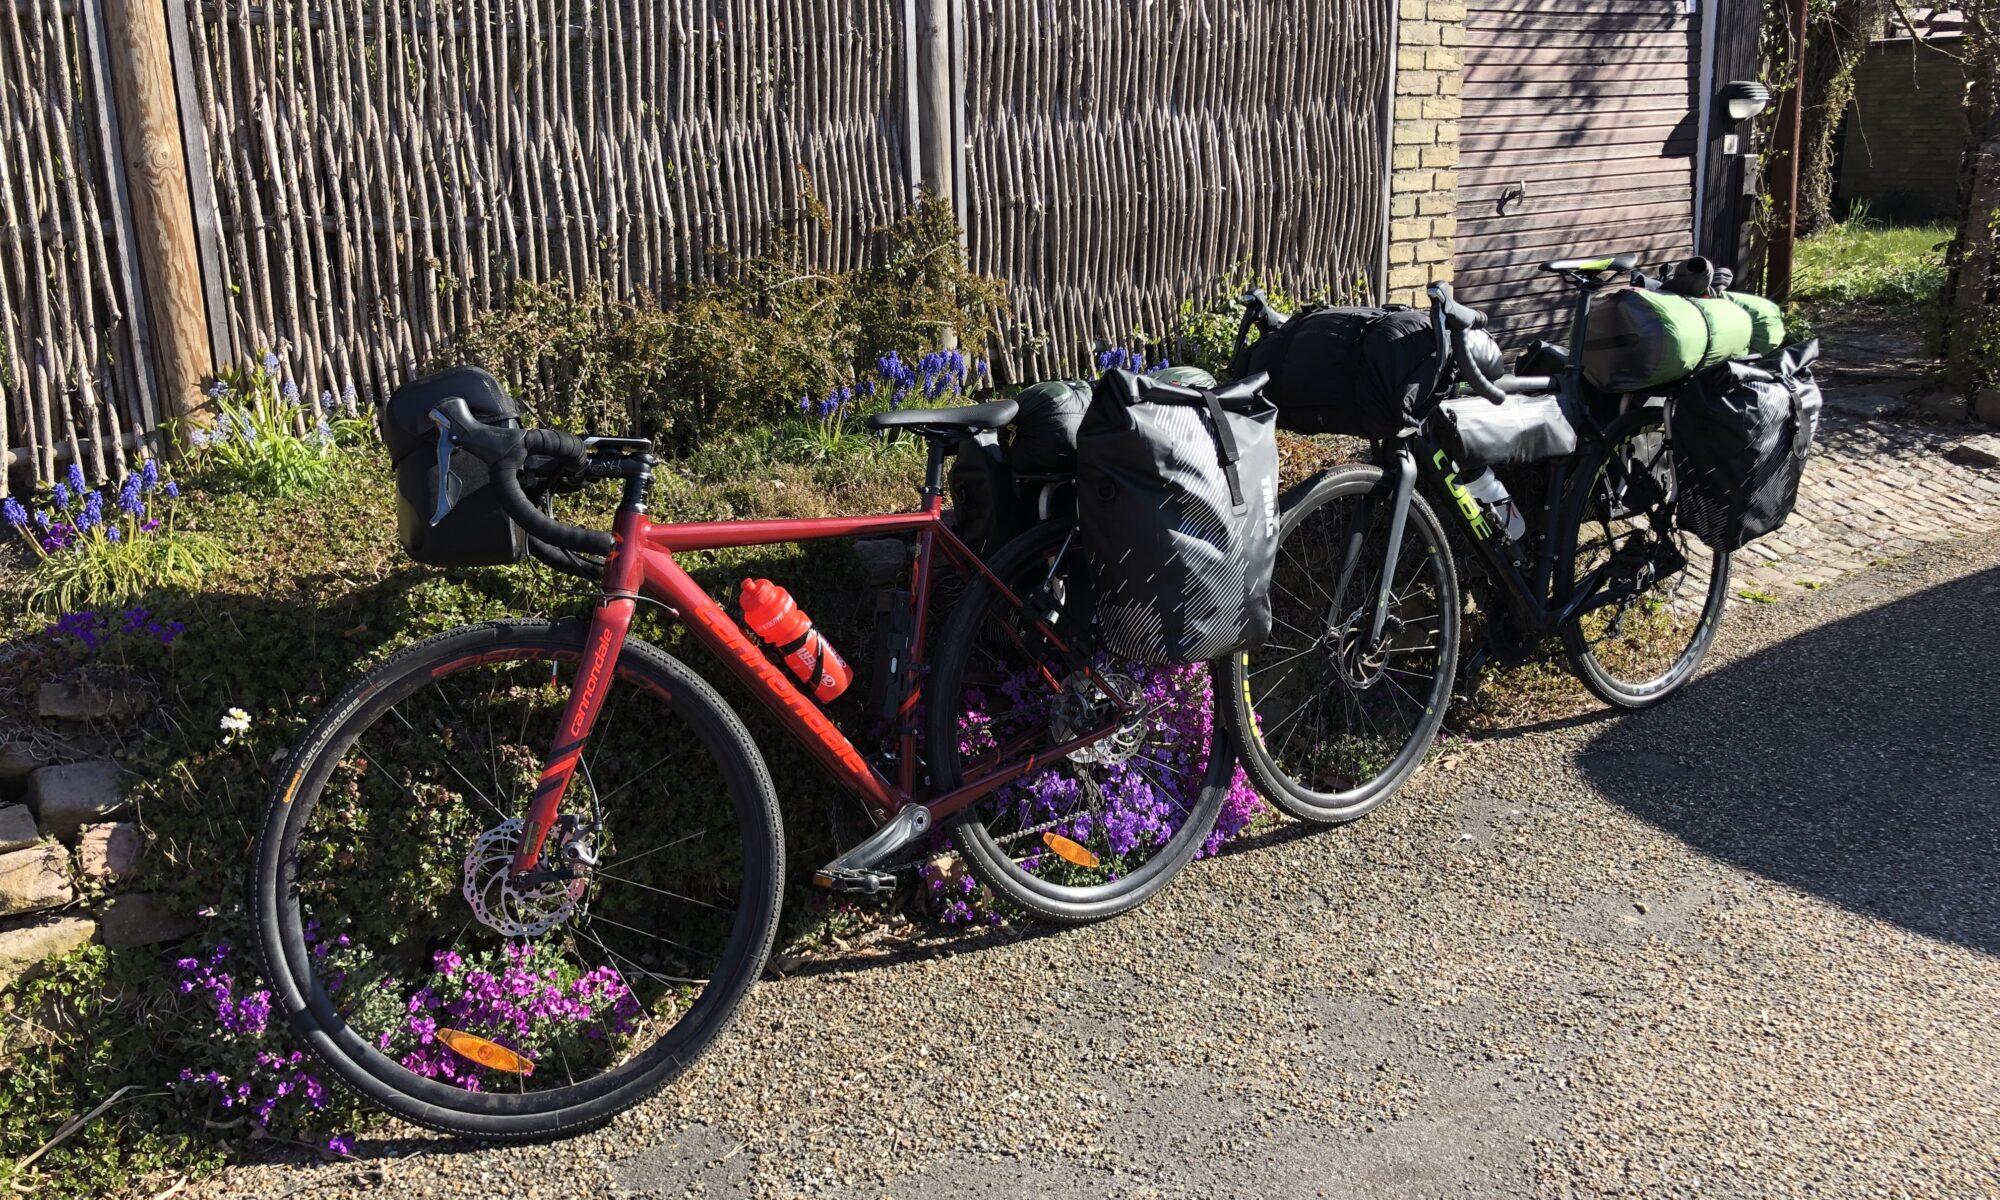 Vores bikepacking sommerferie 2019